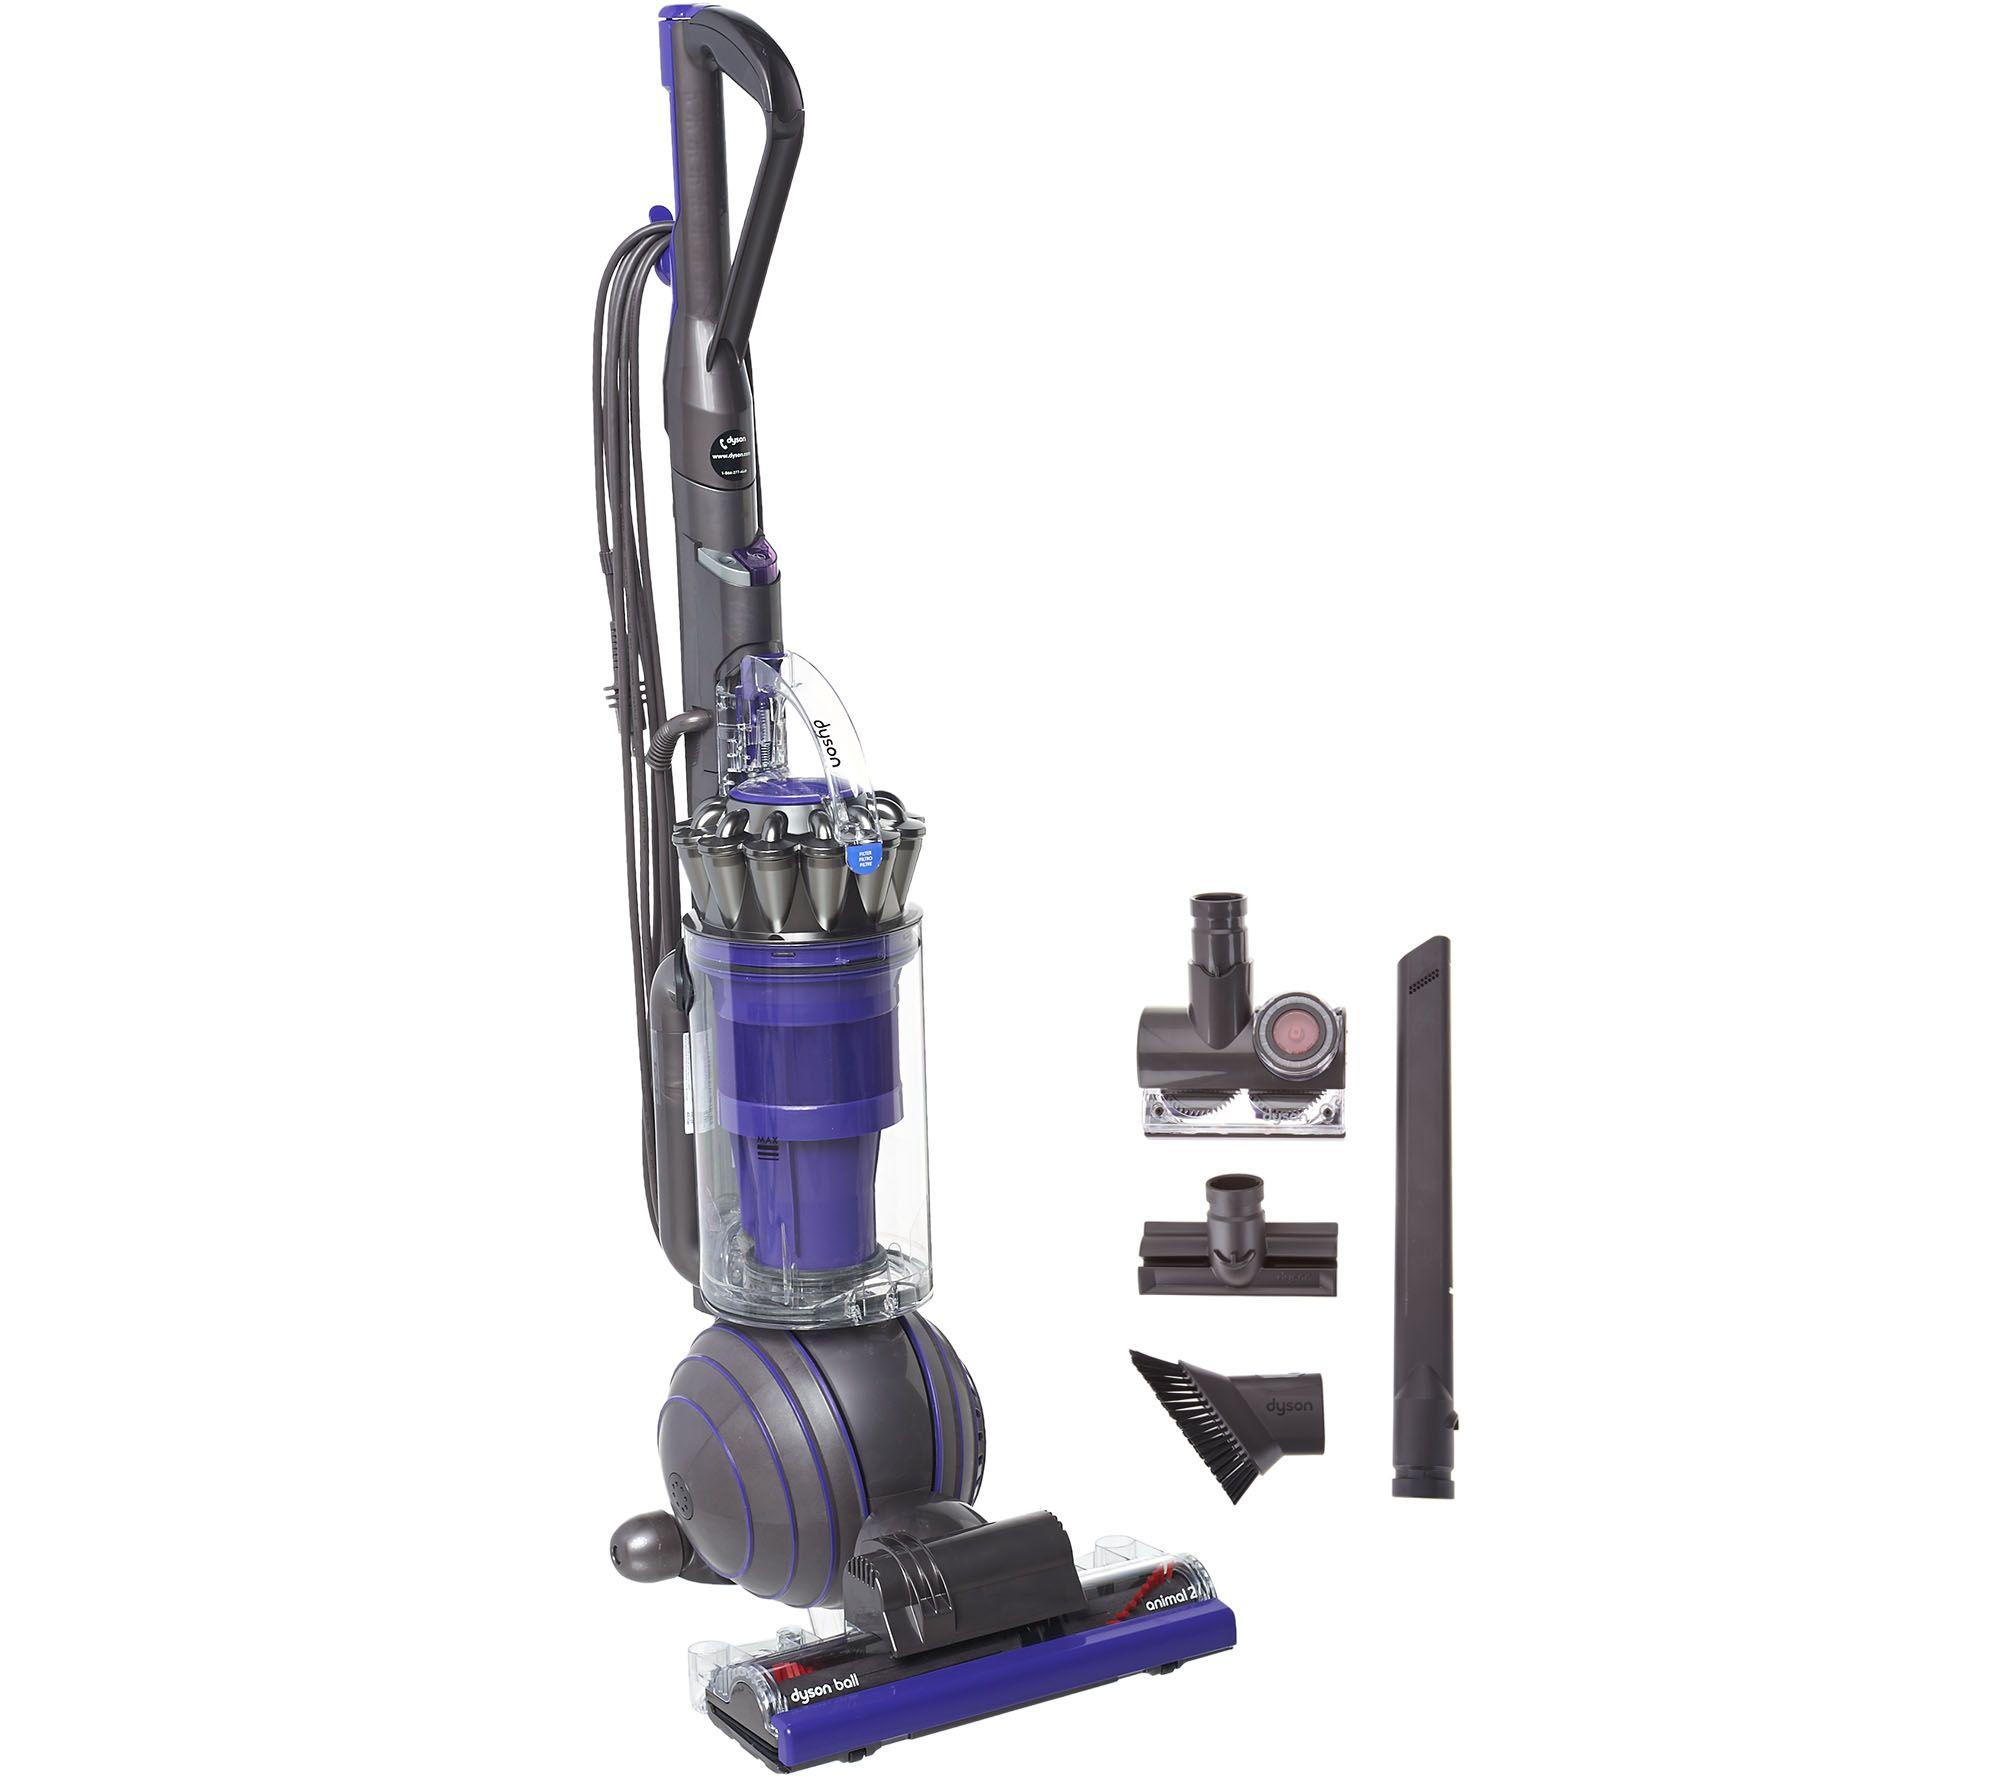 Dyson Ball upright vacuum